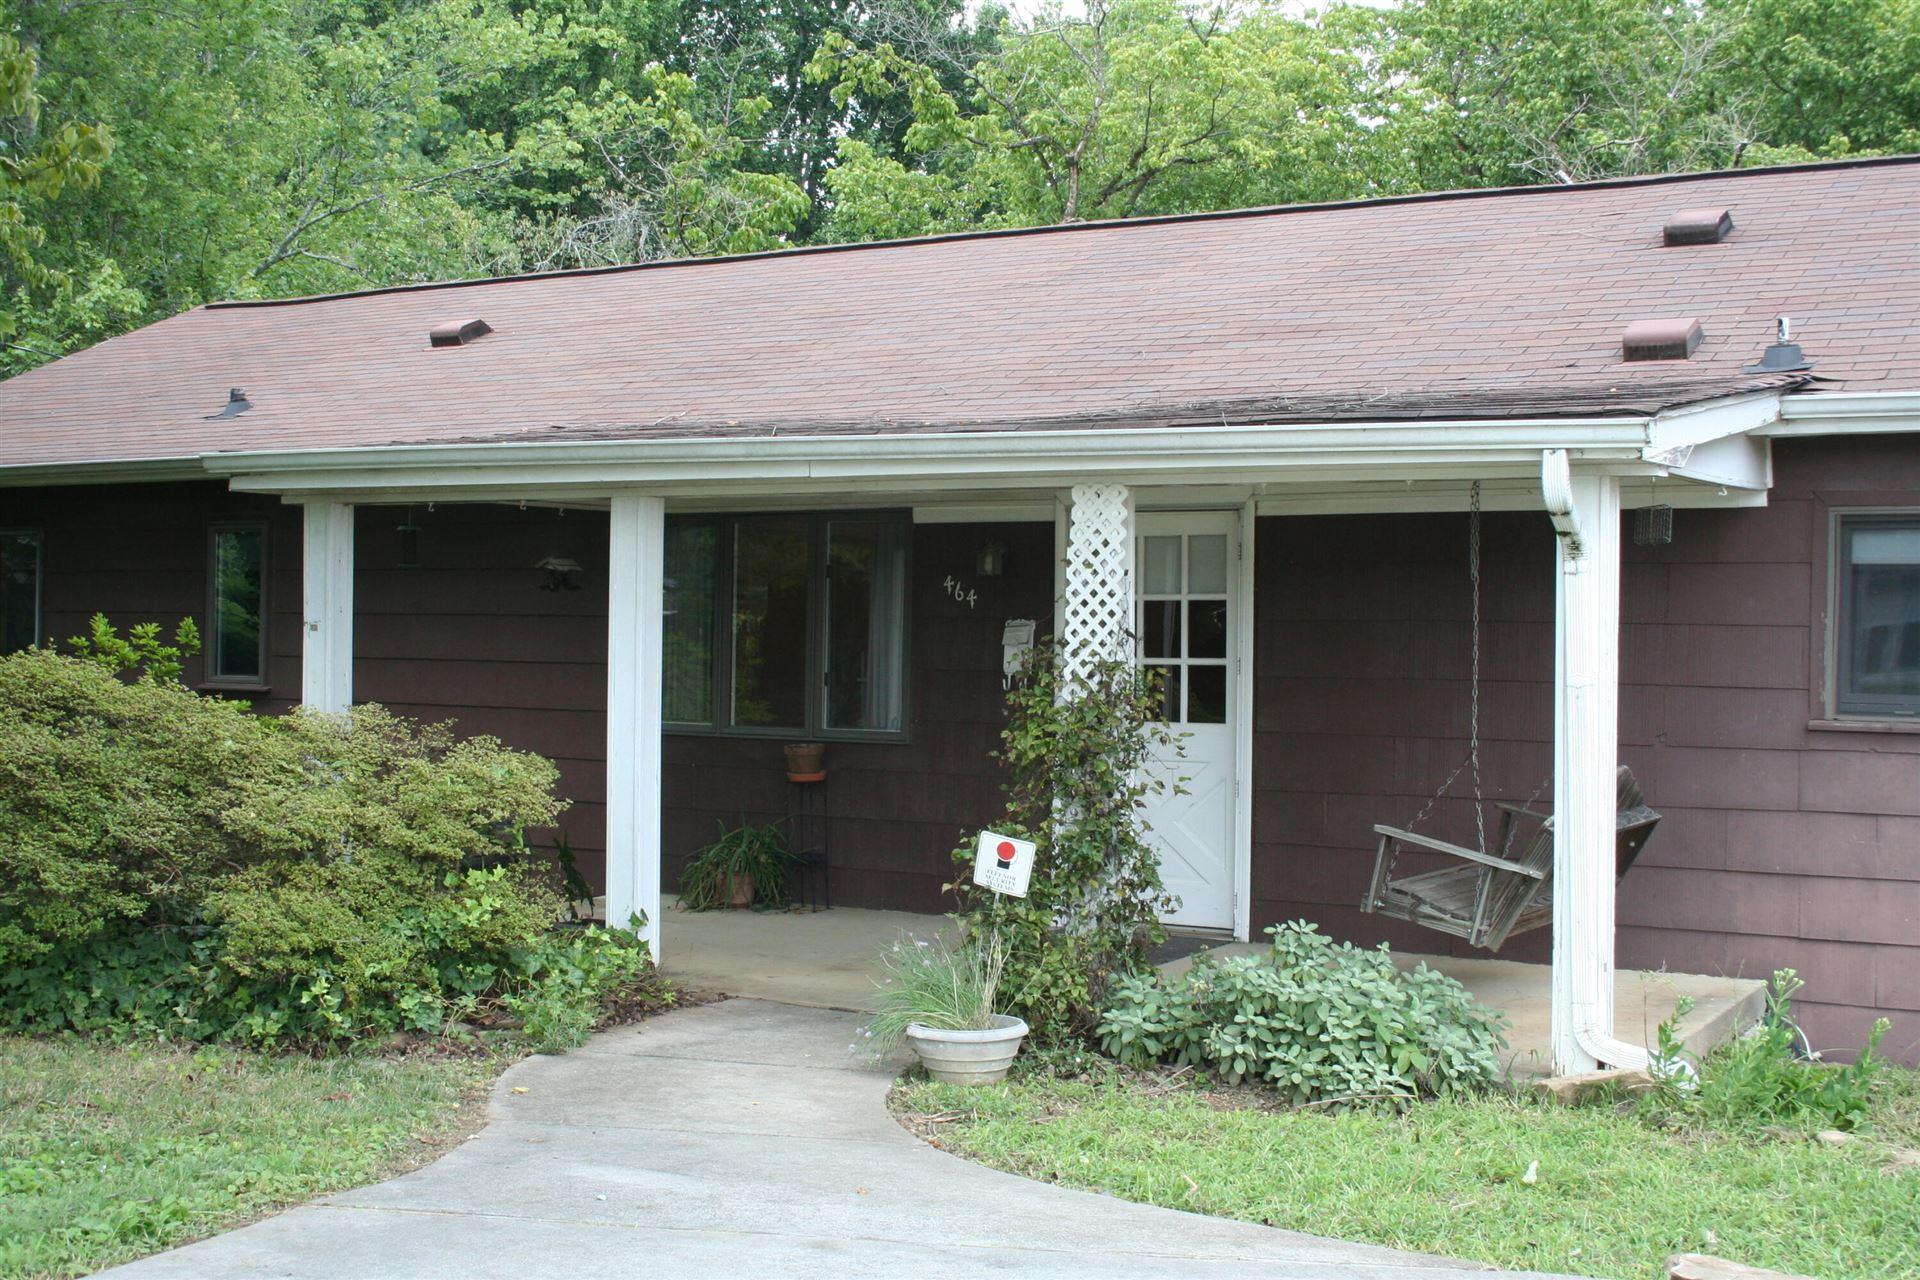 Photo of 464 W Outer Drive, Oak Ridge, TN 37830 (MLS # 1161186)